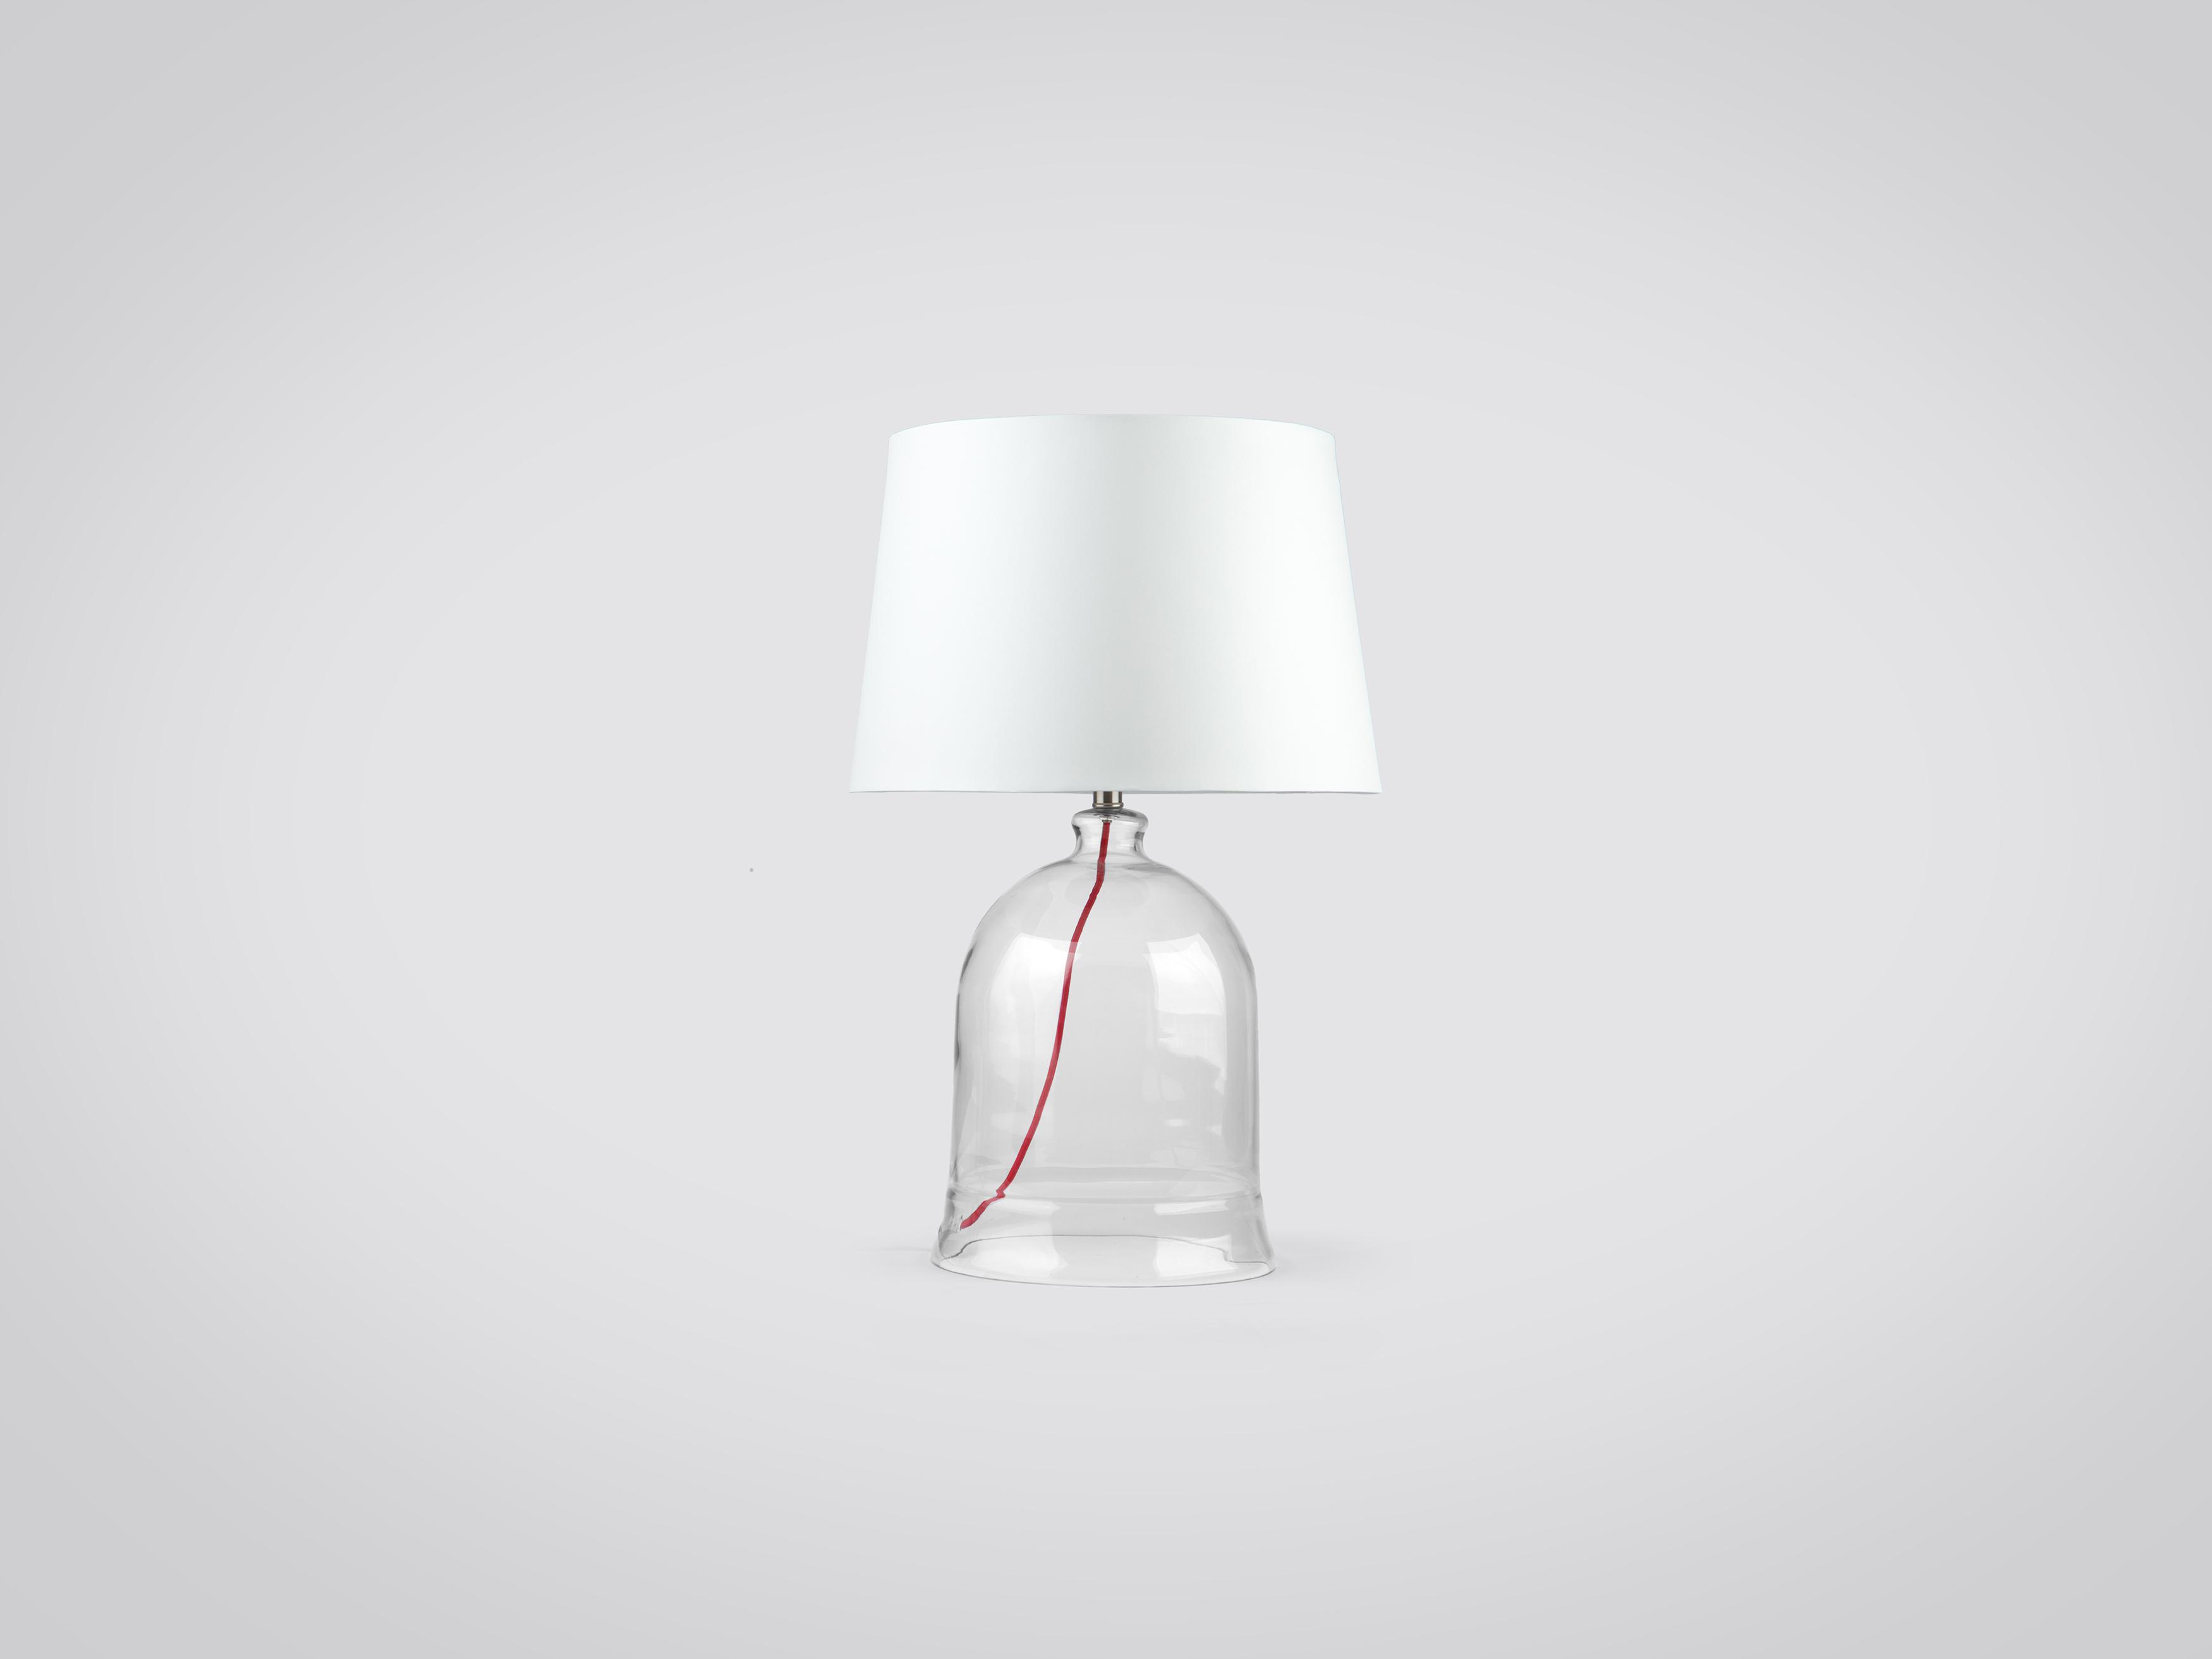 Купить Лампа настольная с белым абажуром, inmyroom, Китай